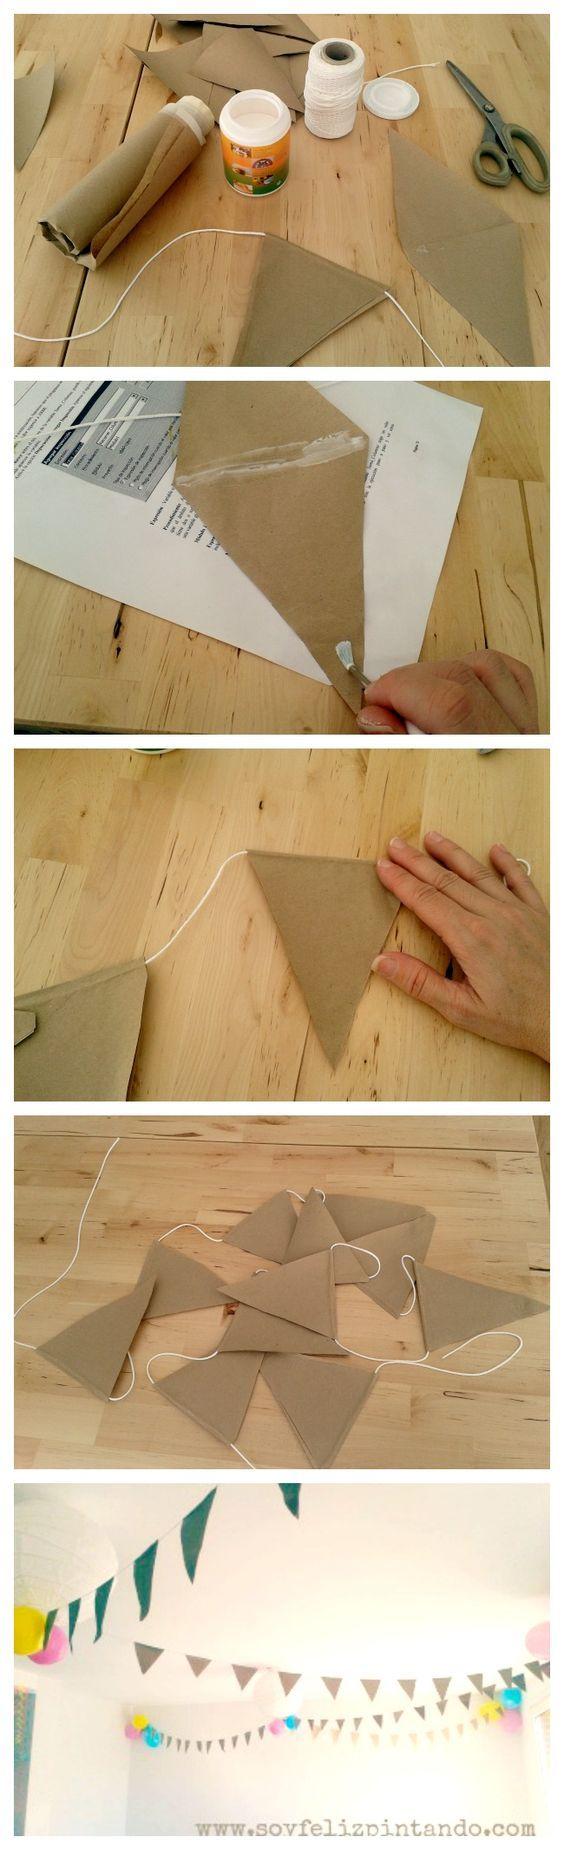 Banderines de papel kraft para decorar cumpleaños - http://xn--manualidadesparacumpleaos-voc.com/banderines-de-papel-kraft-para-decorar-cumpleanos/